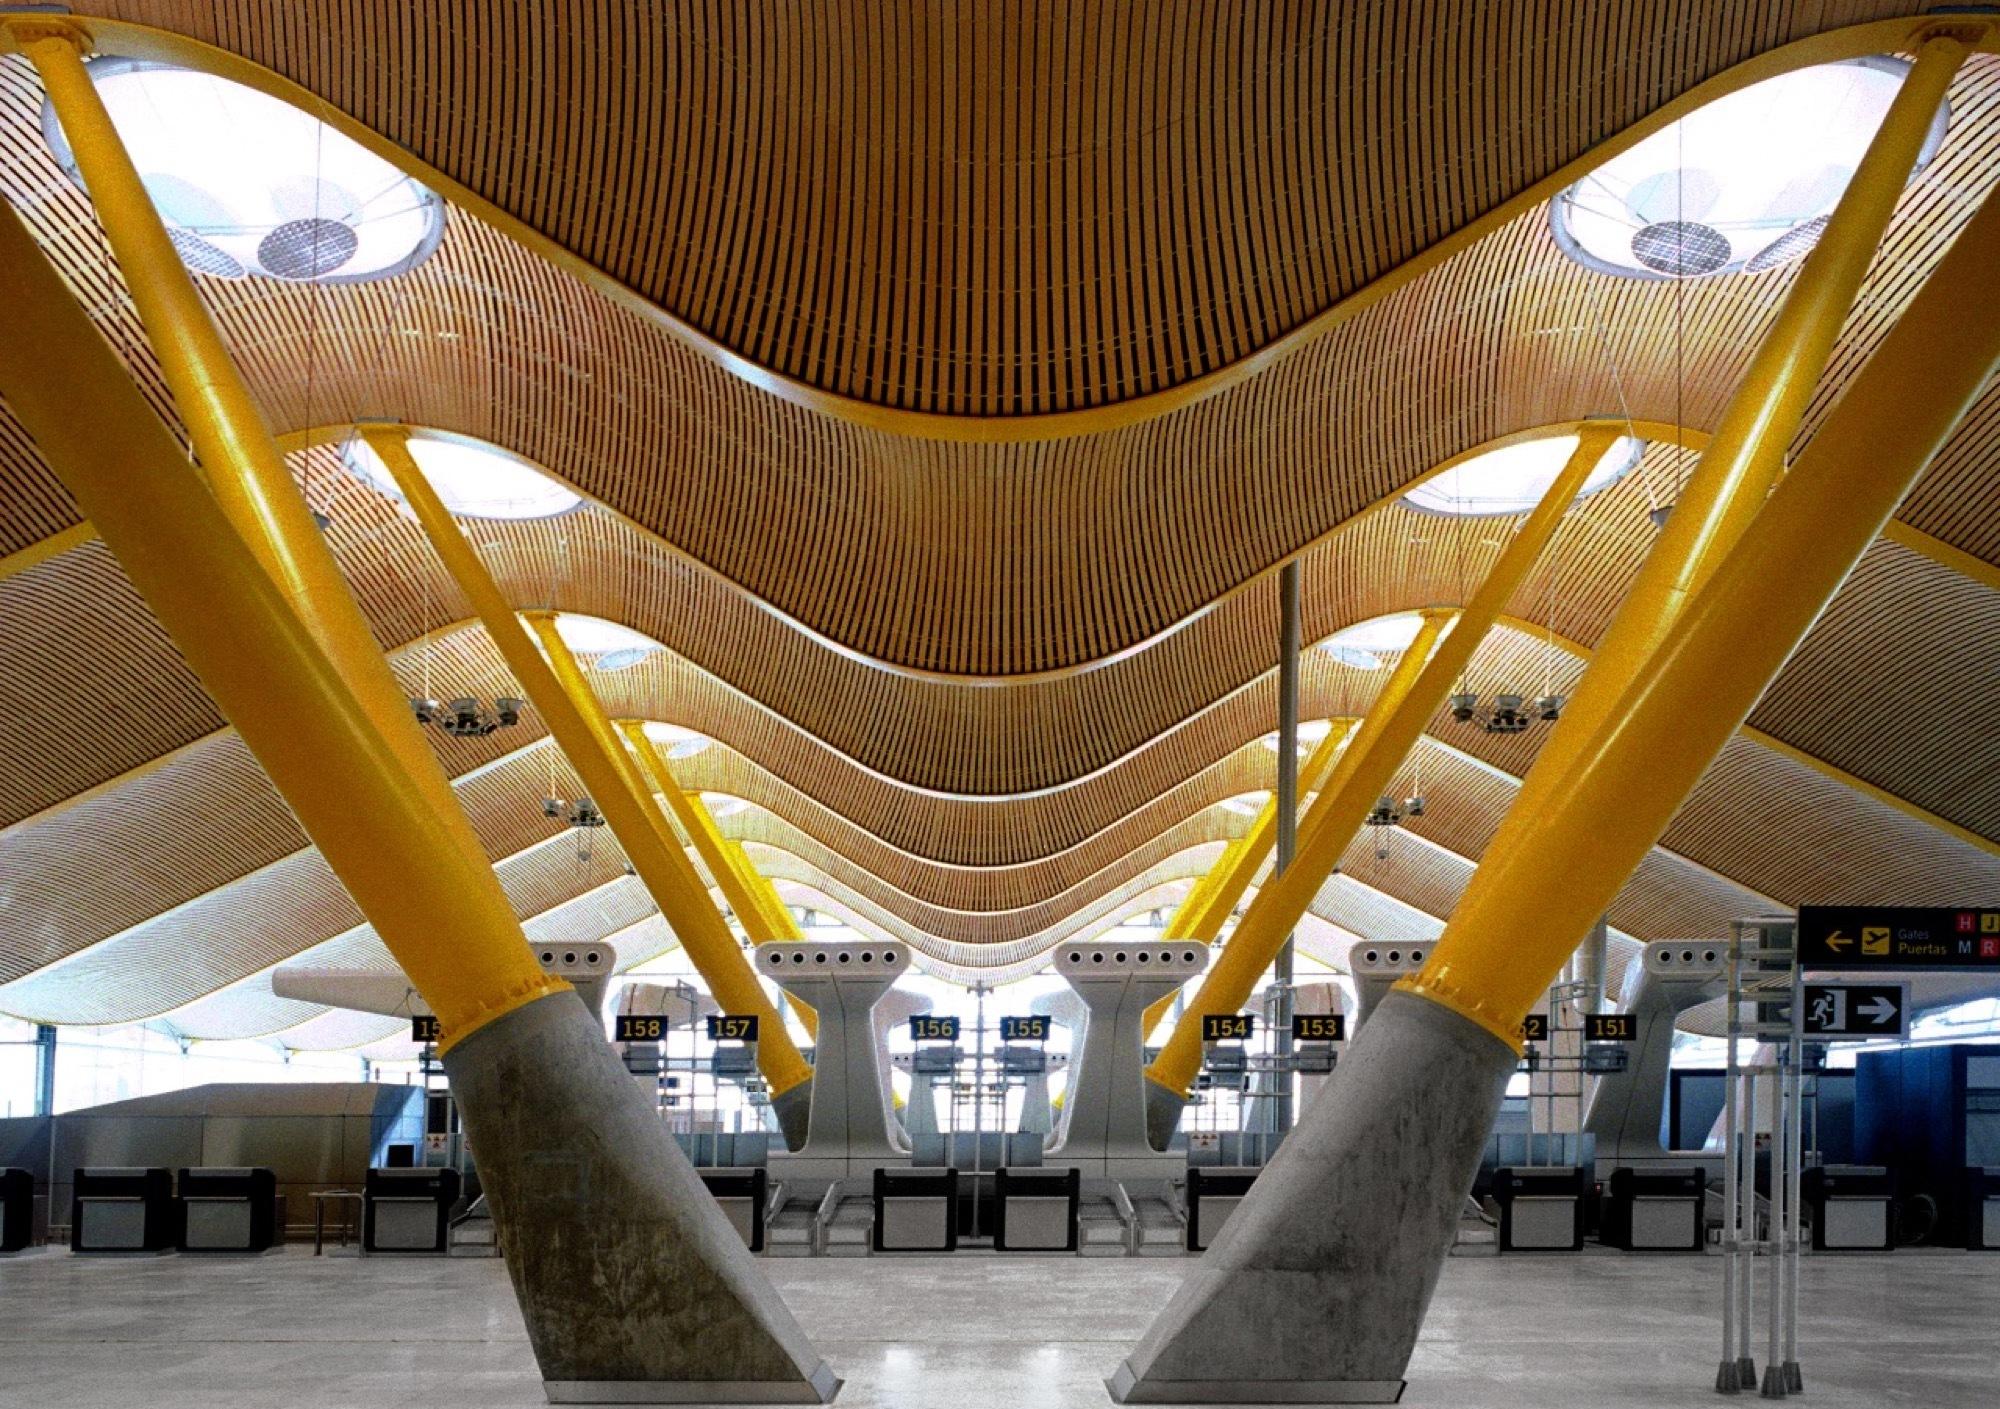 Madrid barajas airport terminal 4 estudio lamela - Terminal ejecutiva barajas ...